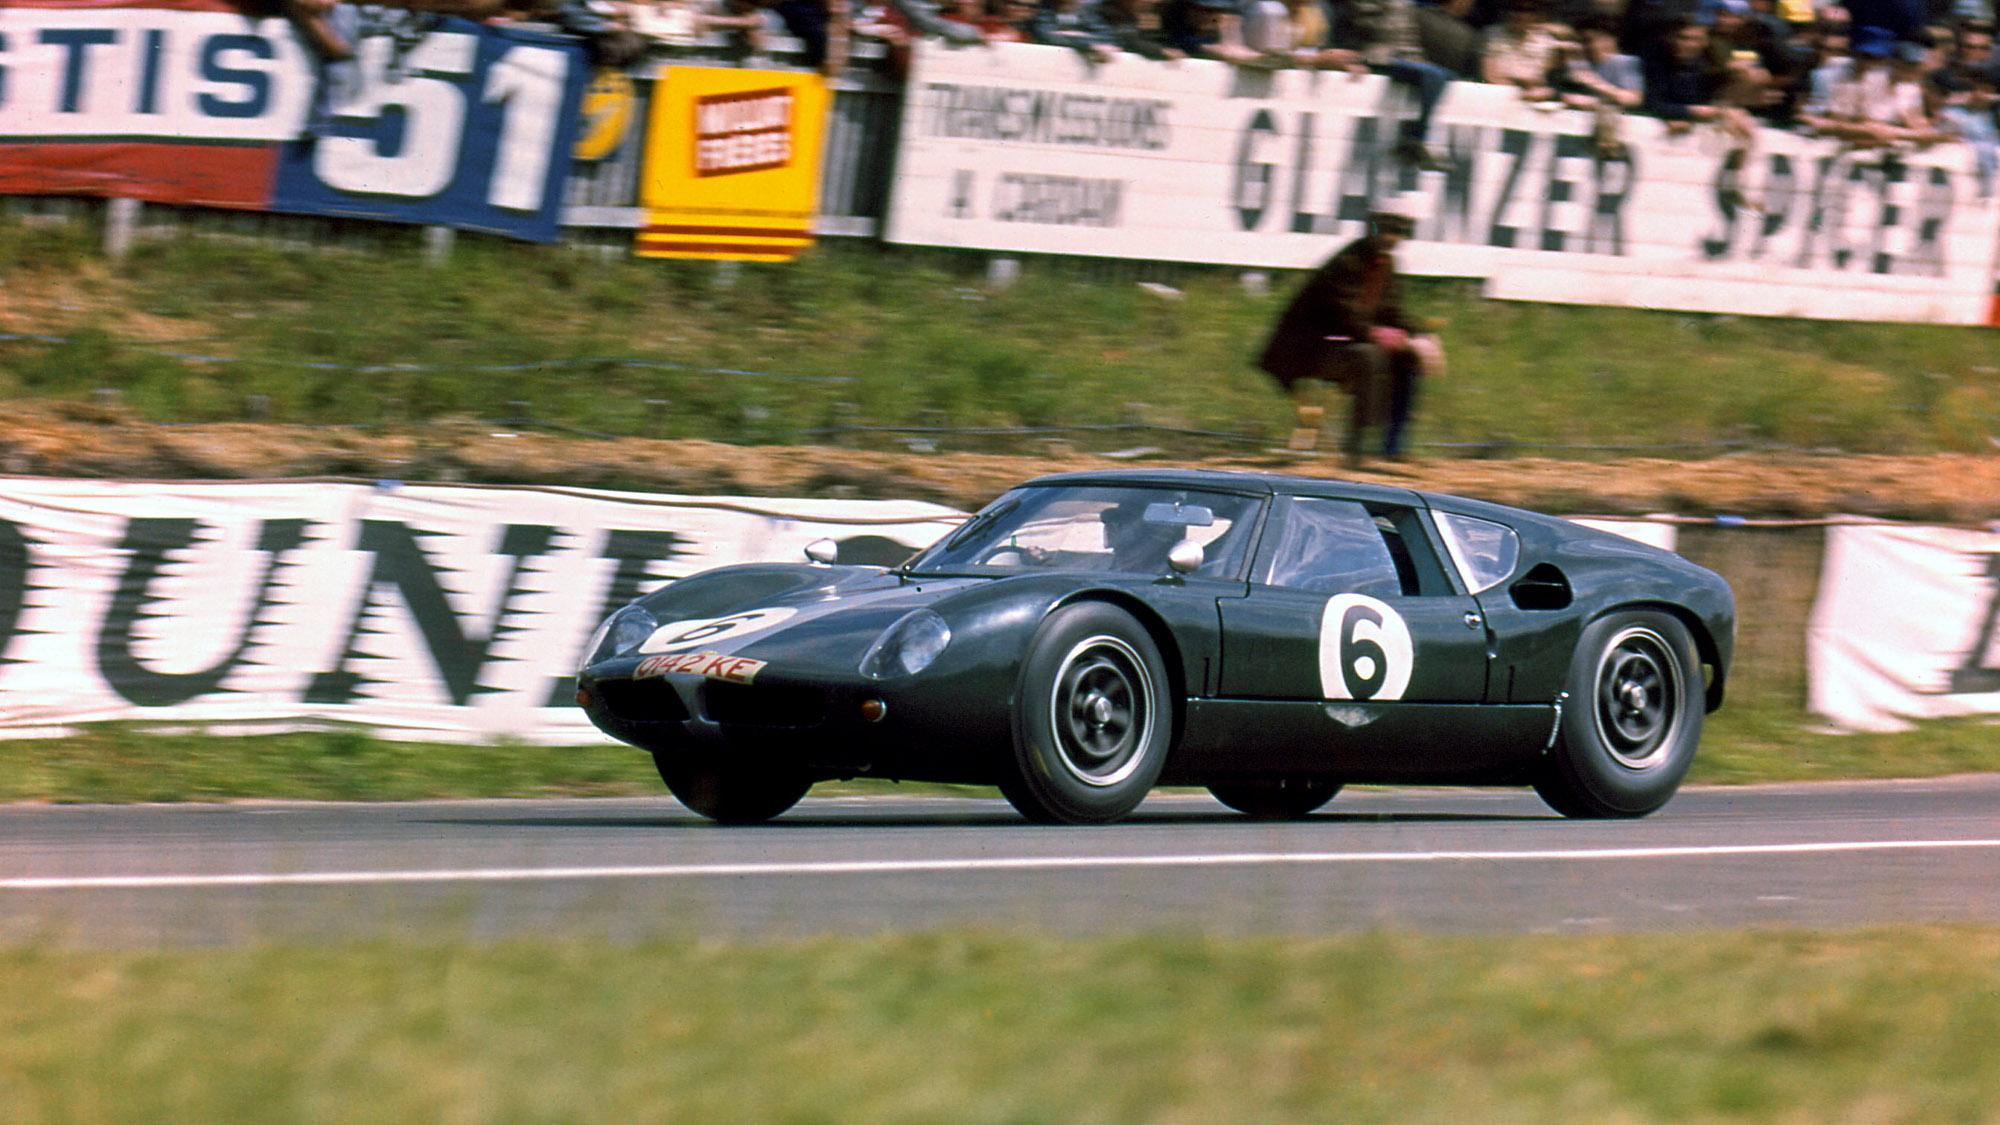 Lola Mk6 GT at Le Mans in 1963